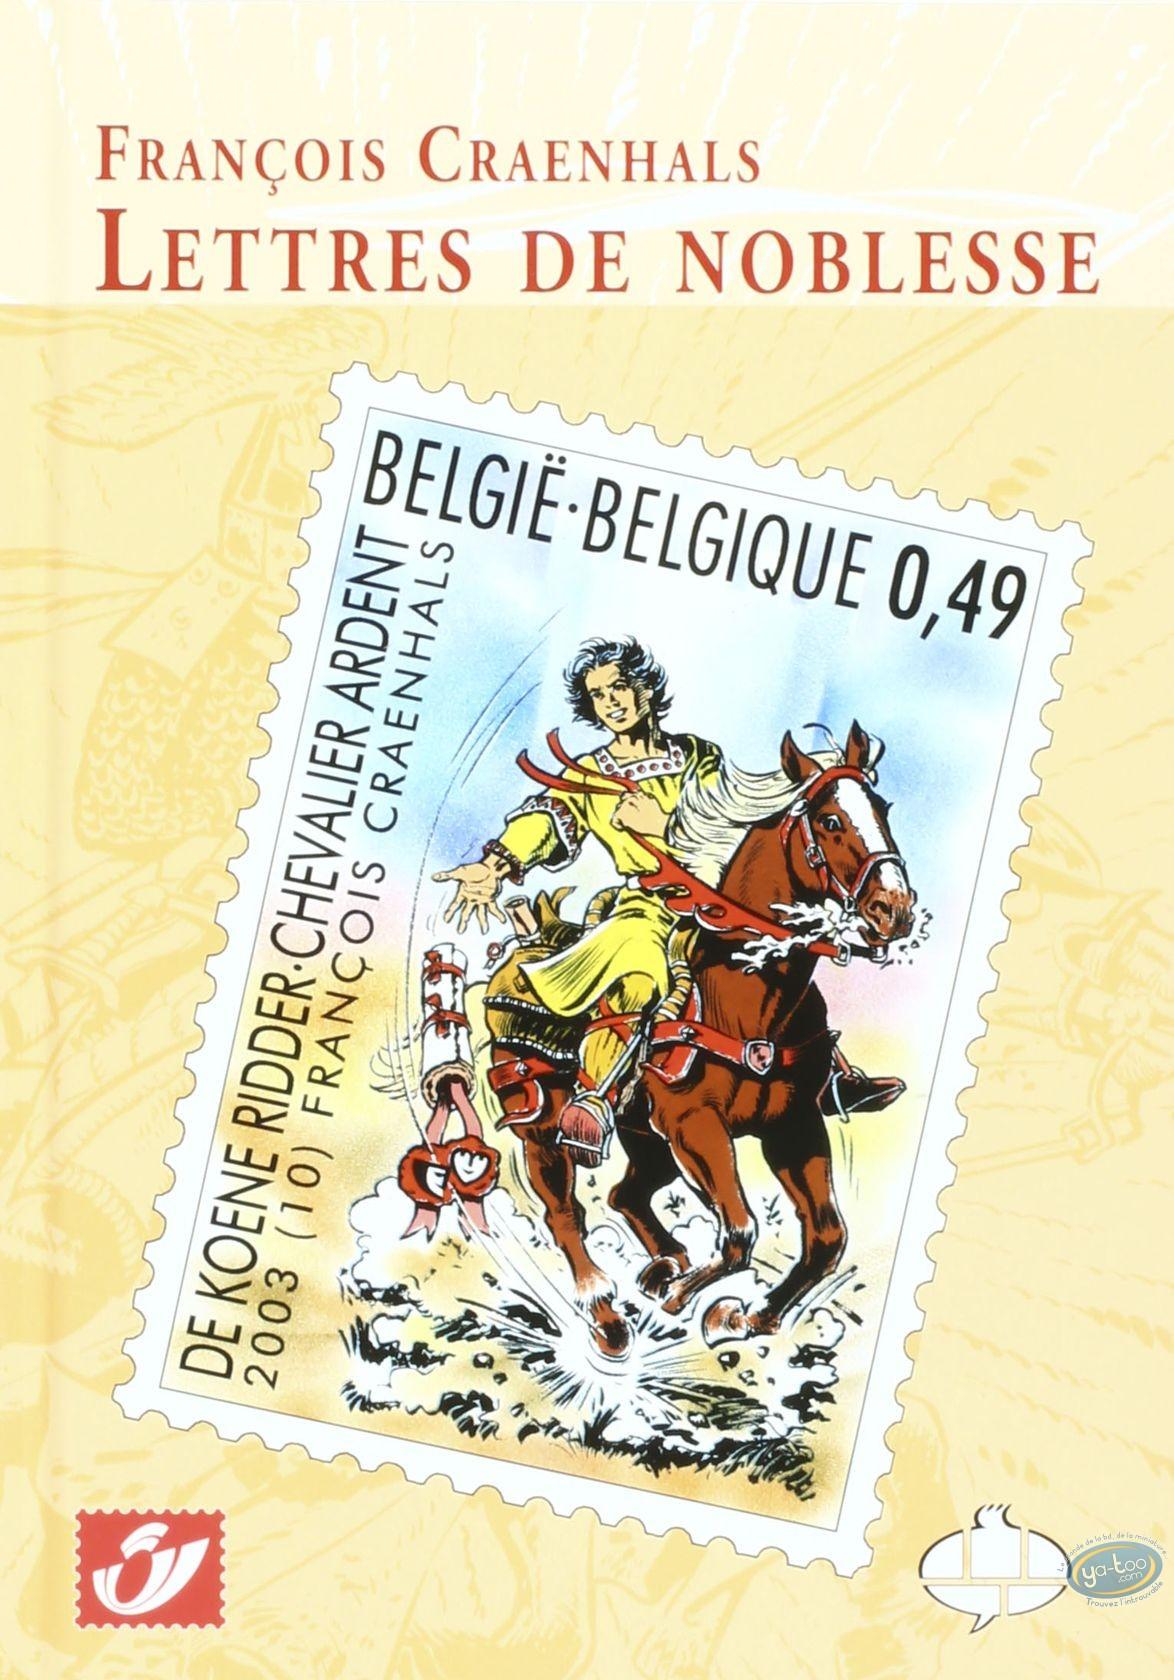 Album + Stamp, Chevalier Ardent : Lettres de Noblesse